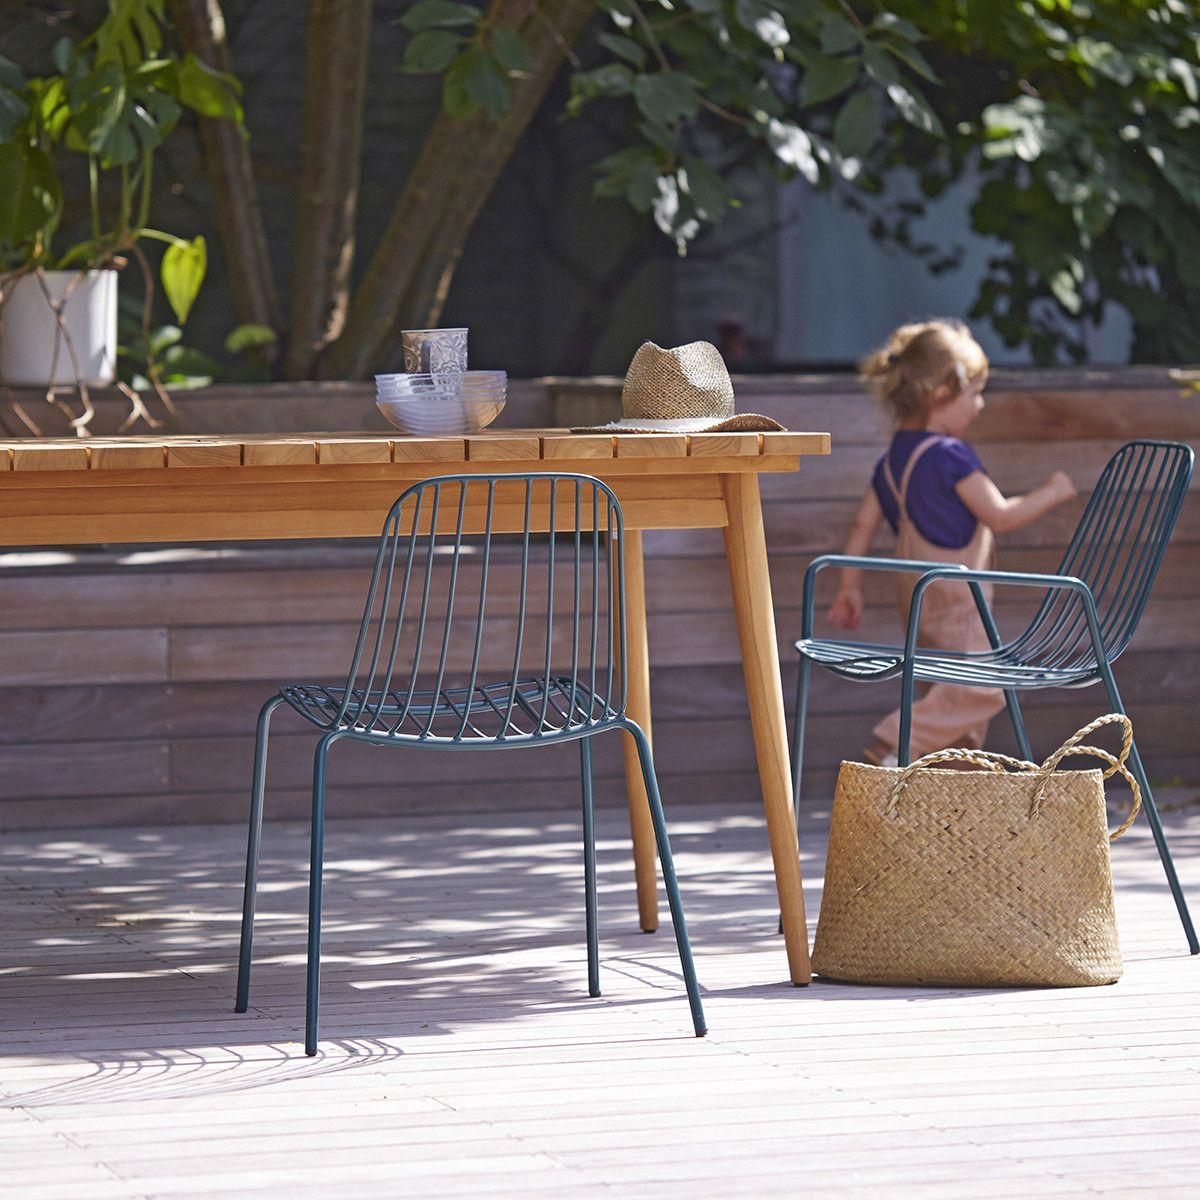 Vadim Teak Outdoor Table 180 In 2020 Outdoor Furniture Sets Twig Furniture Garden Table